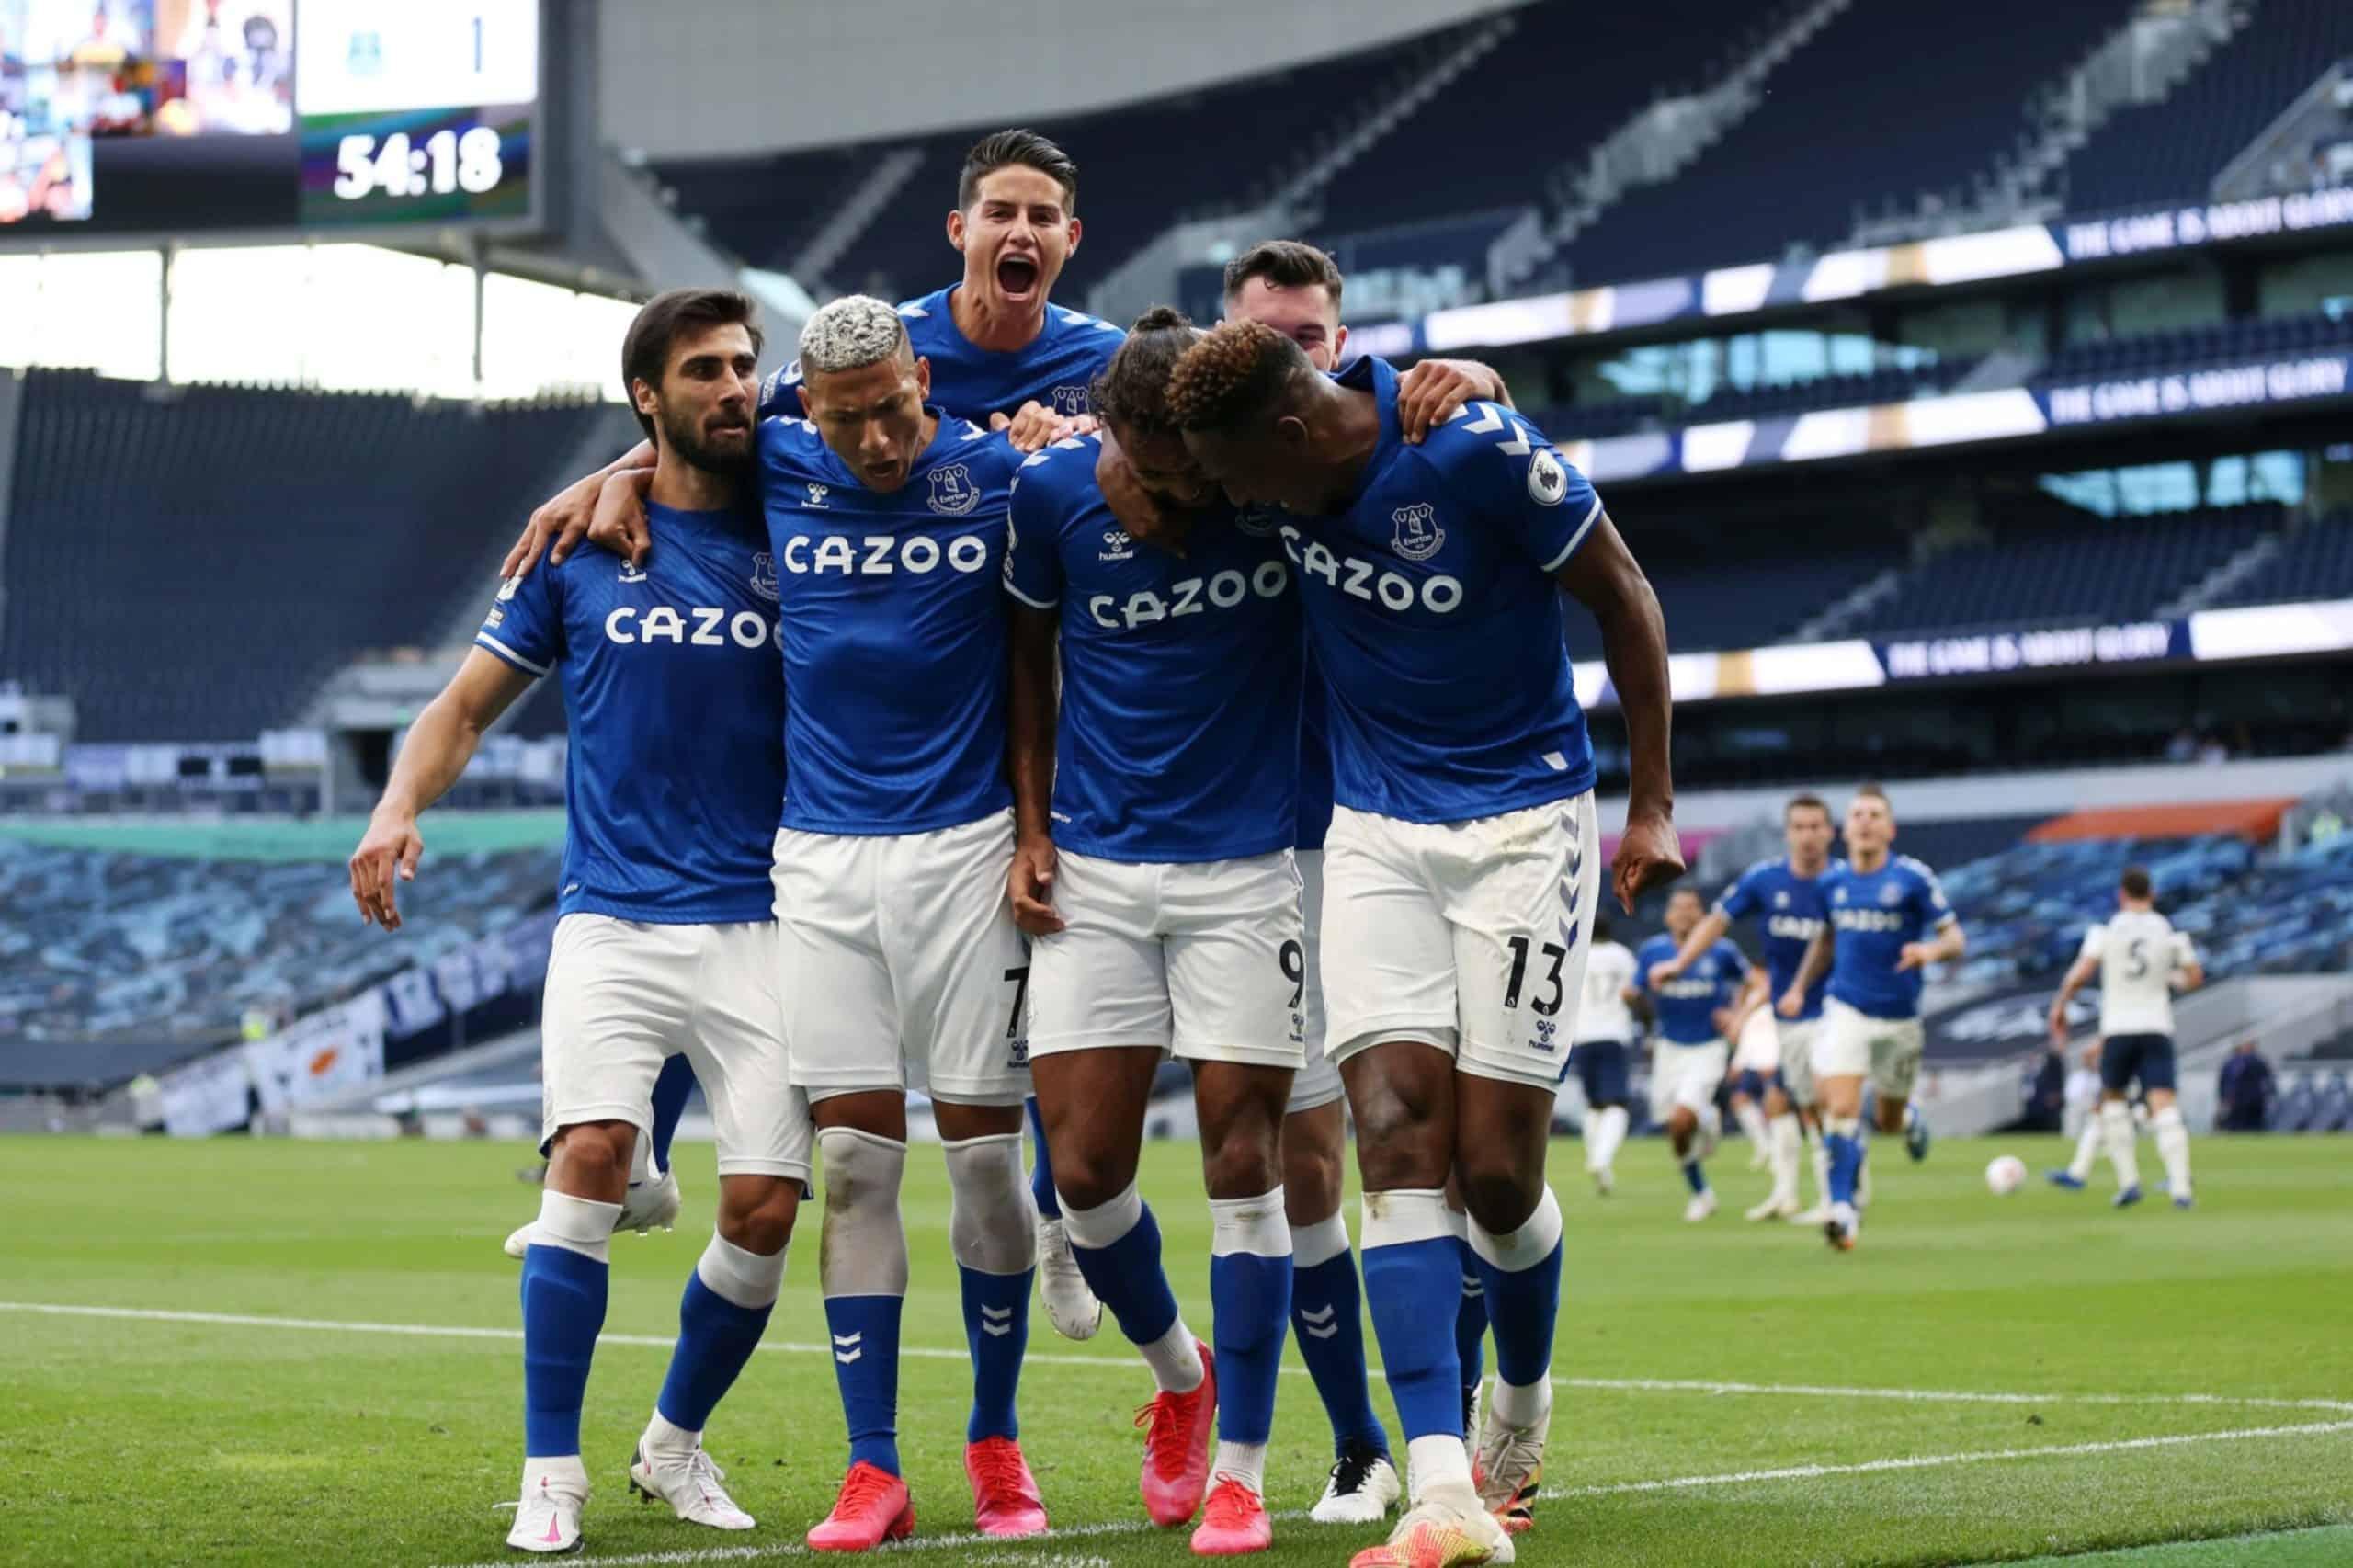 Prediksi Southampton Vs Everton 25 Oktober 2020 Sepakbola Id